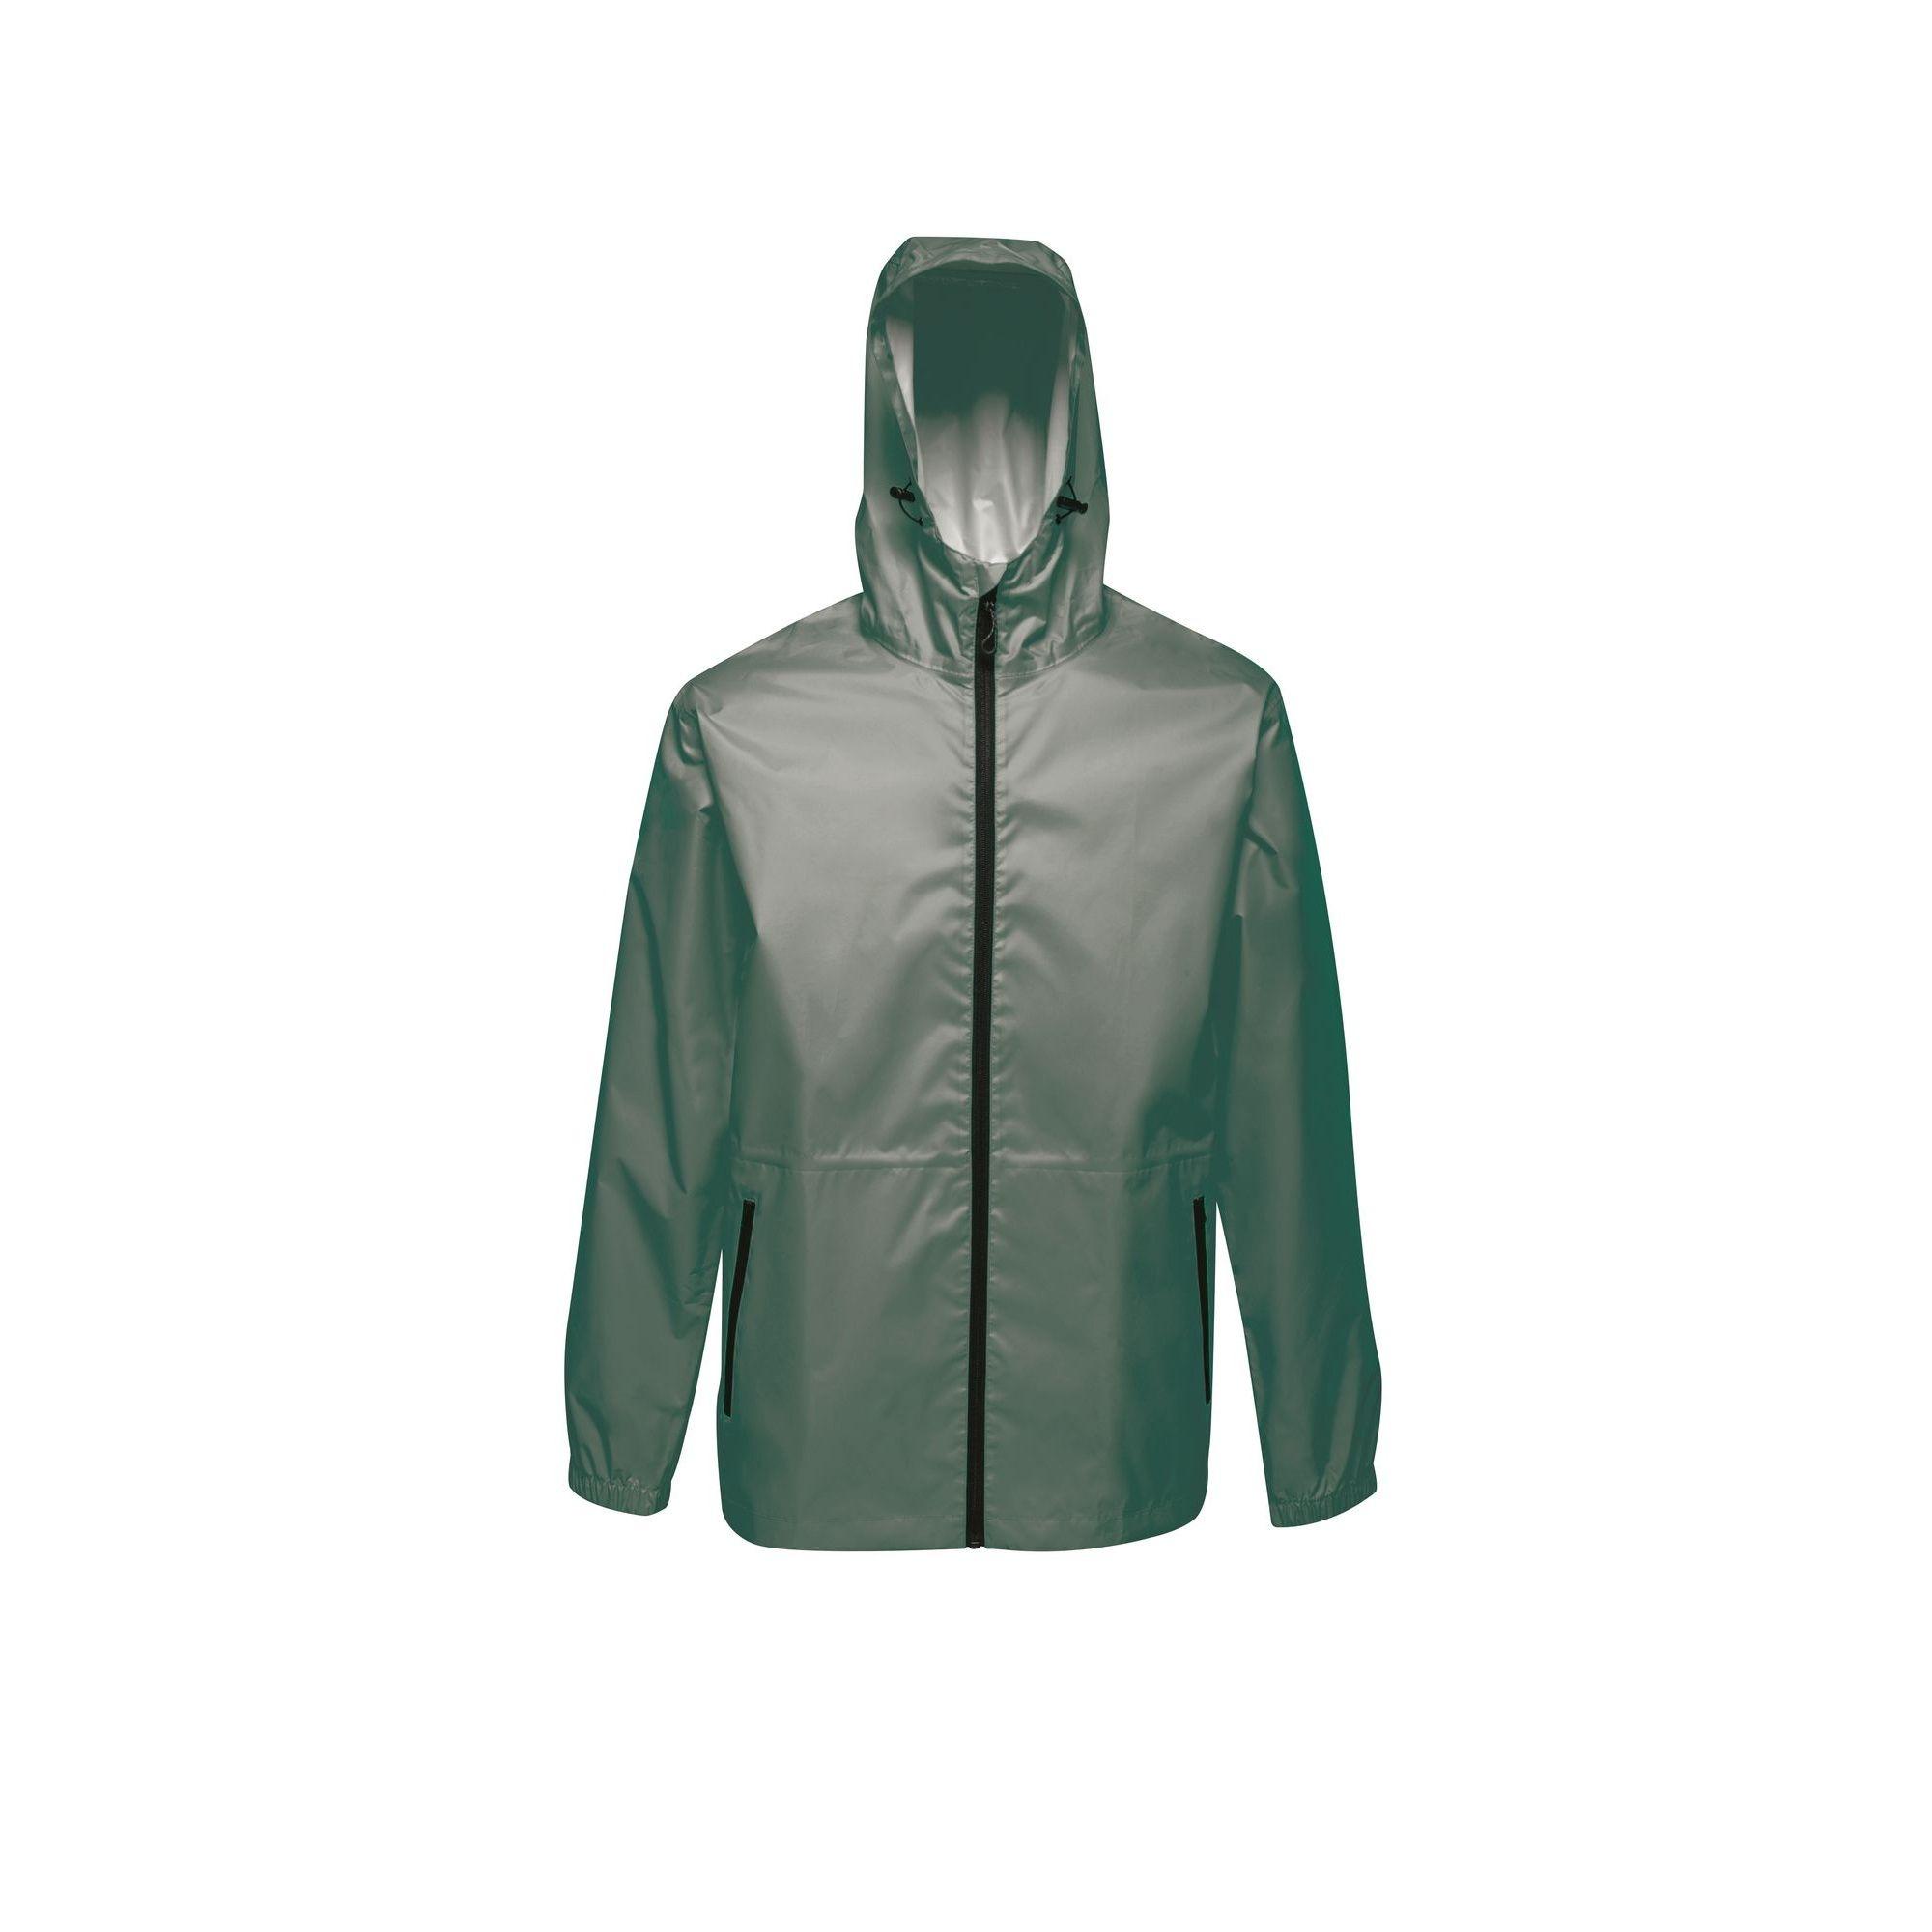 Regatta Mens Pro Packaway Jacket